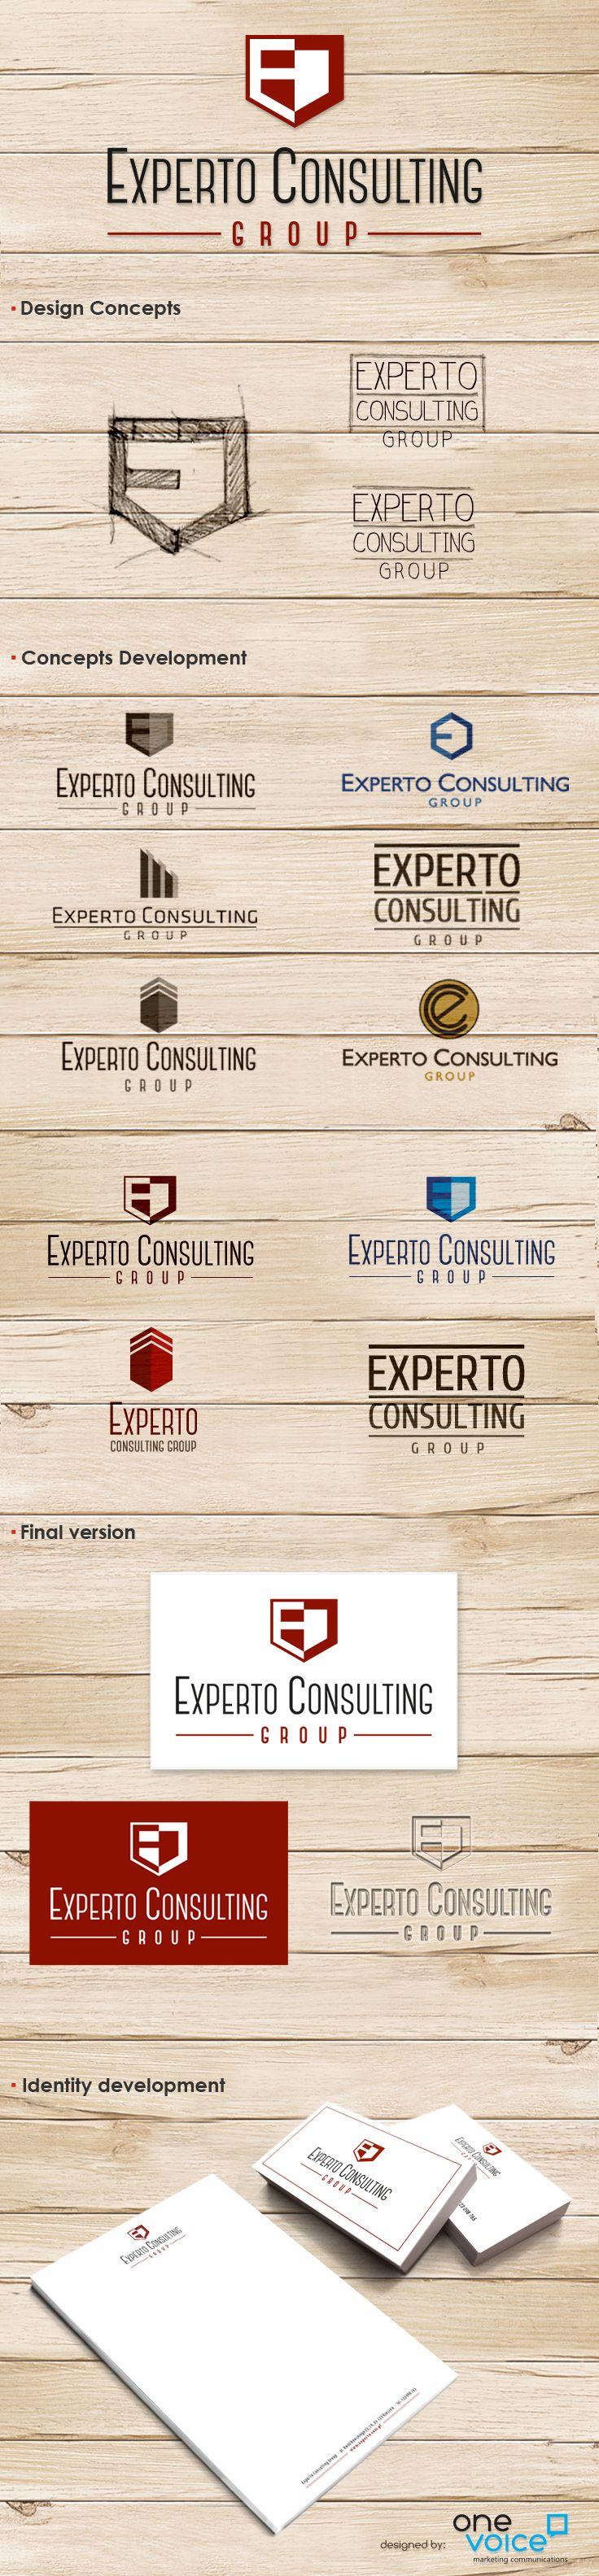 Experto naming and logo design